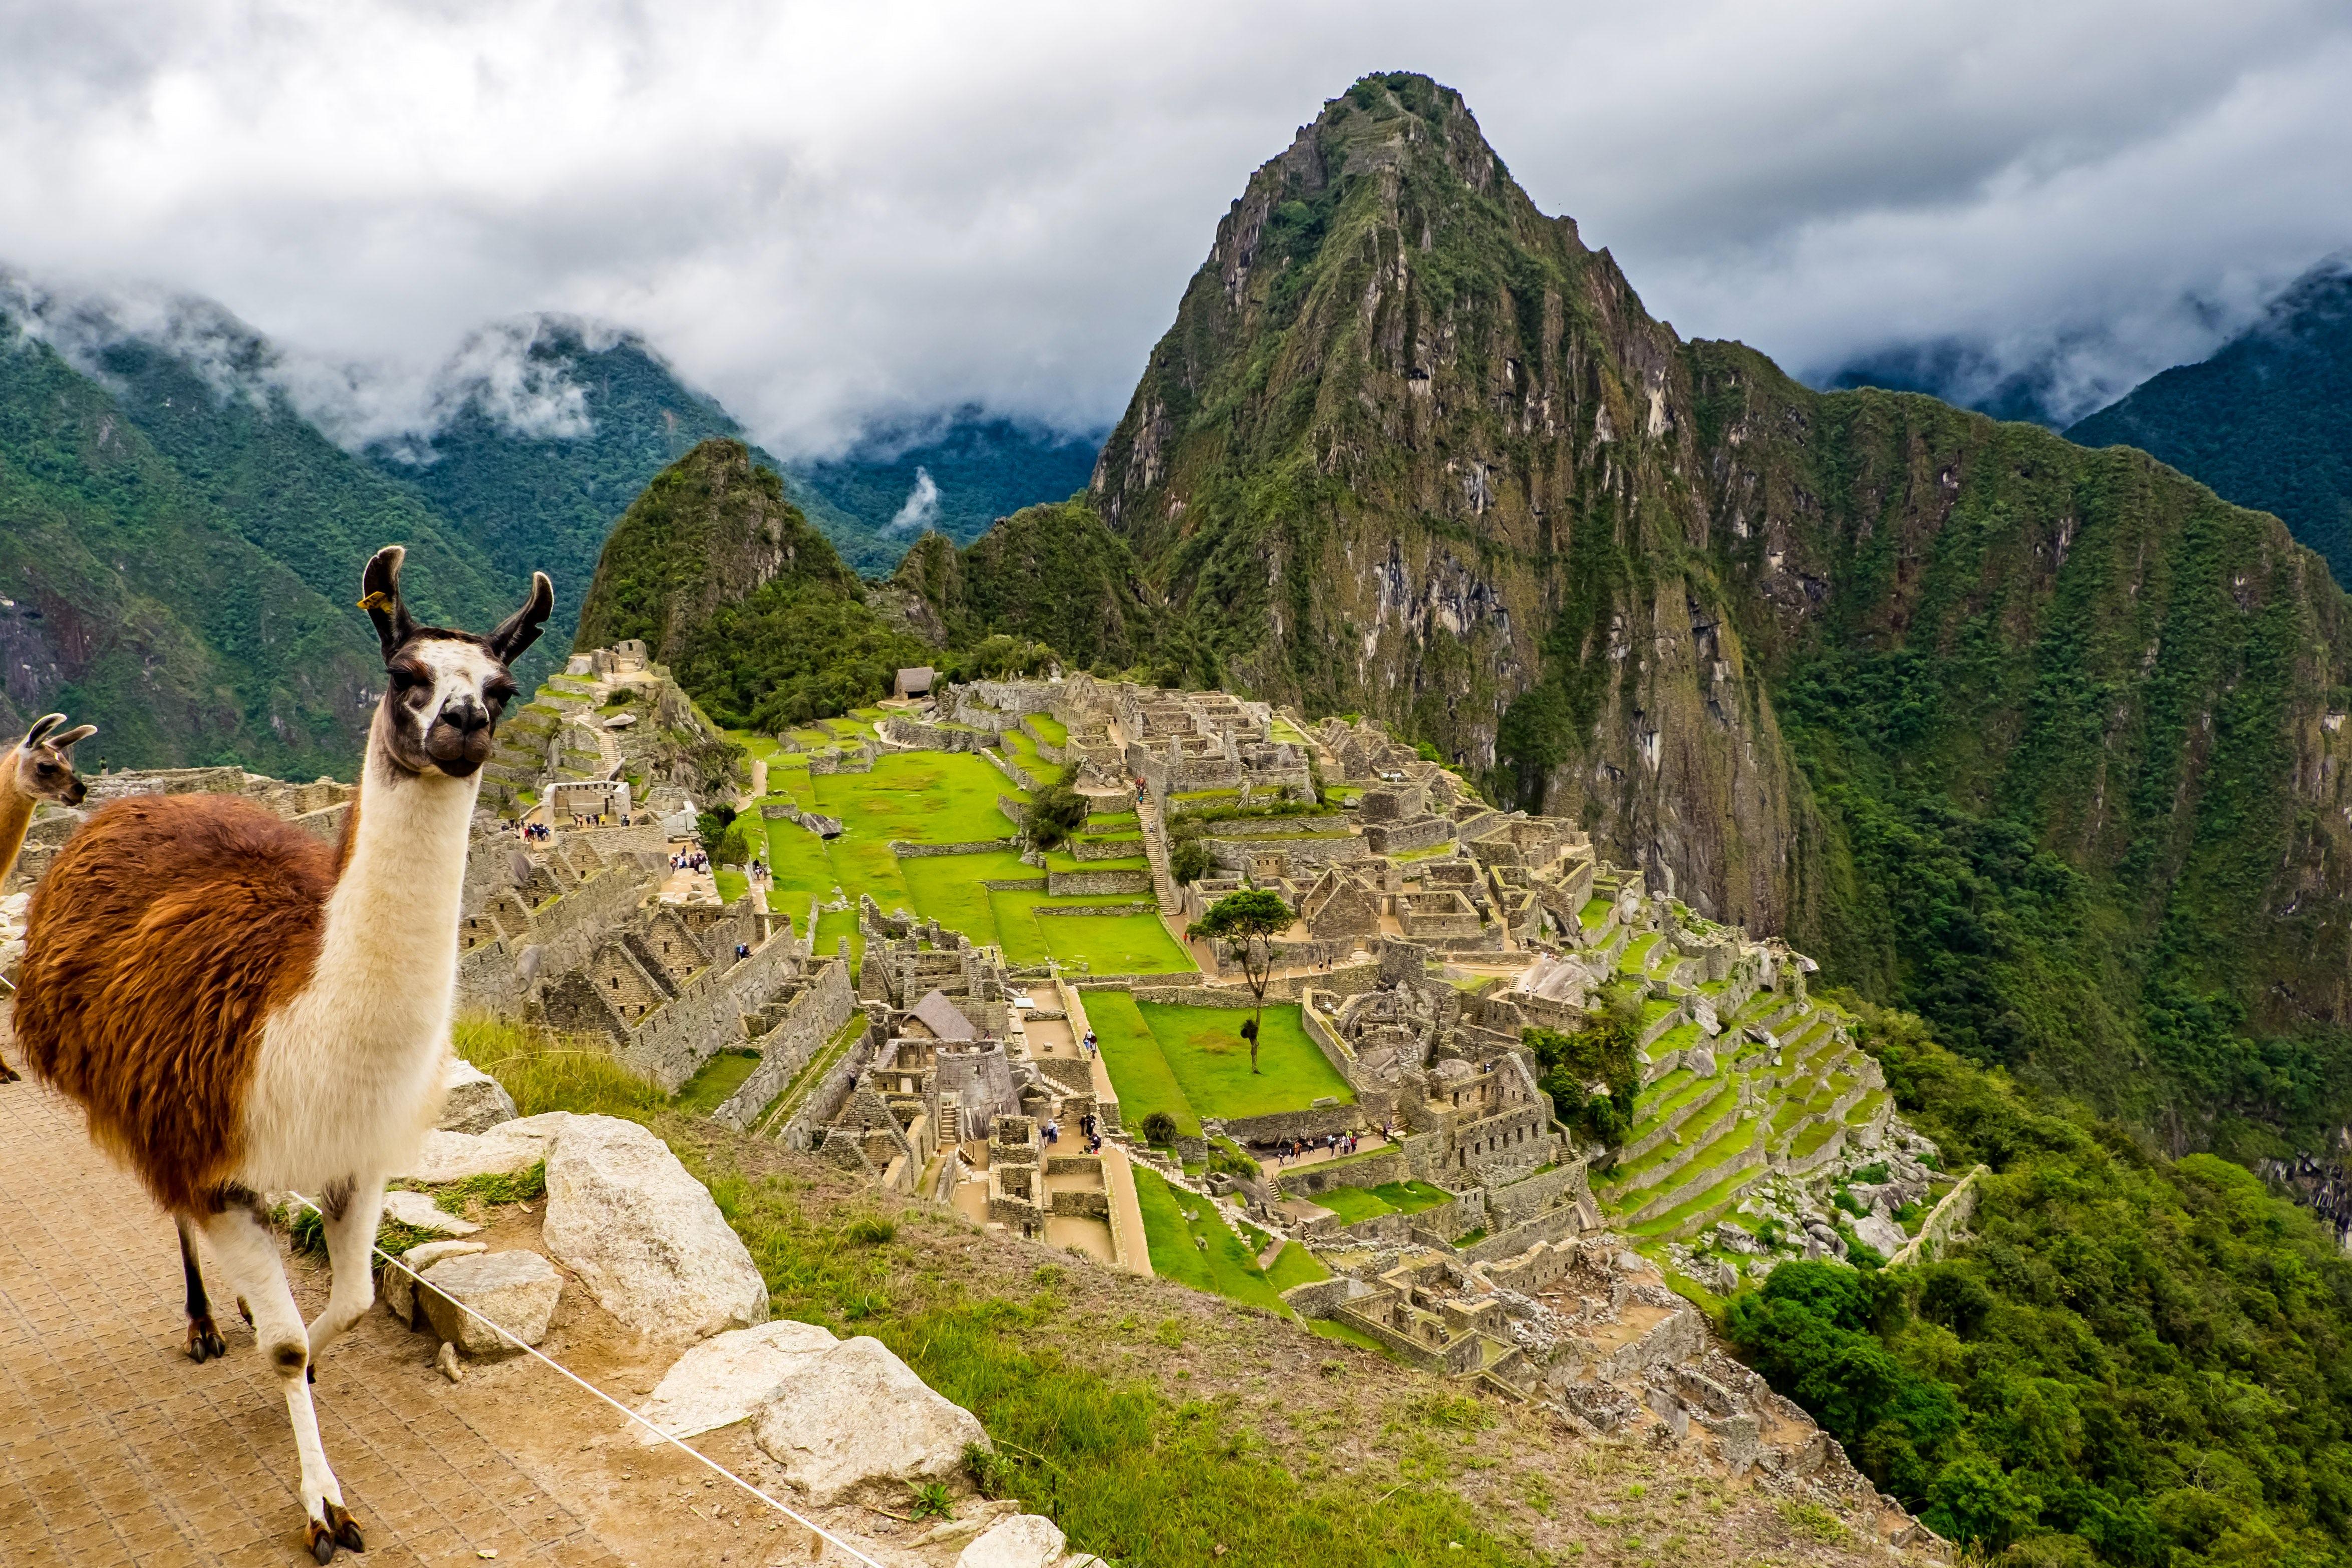 2019 Peru Ladies Only Adventure (Escorted by Tara)